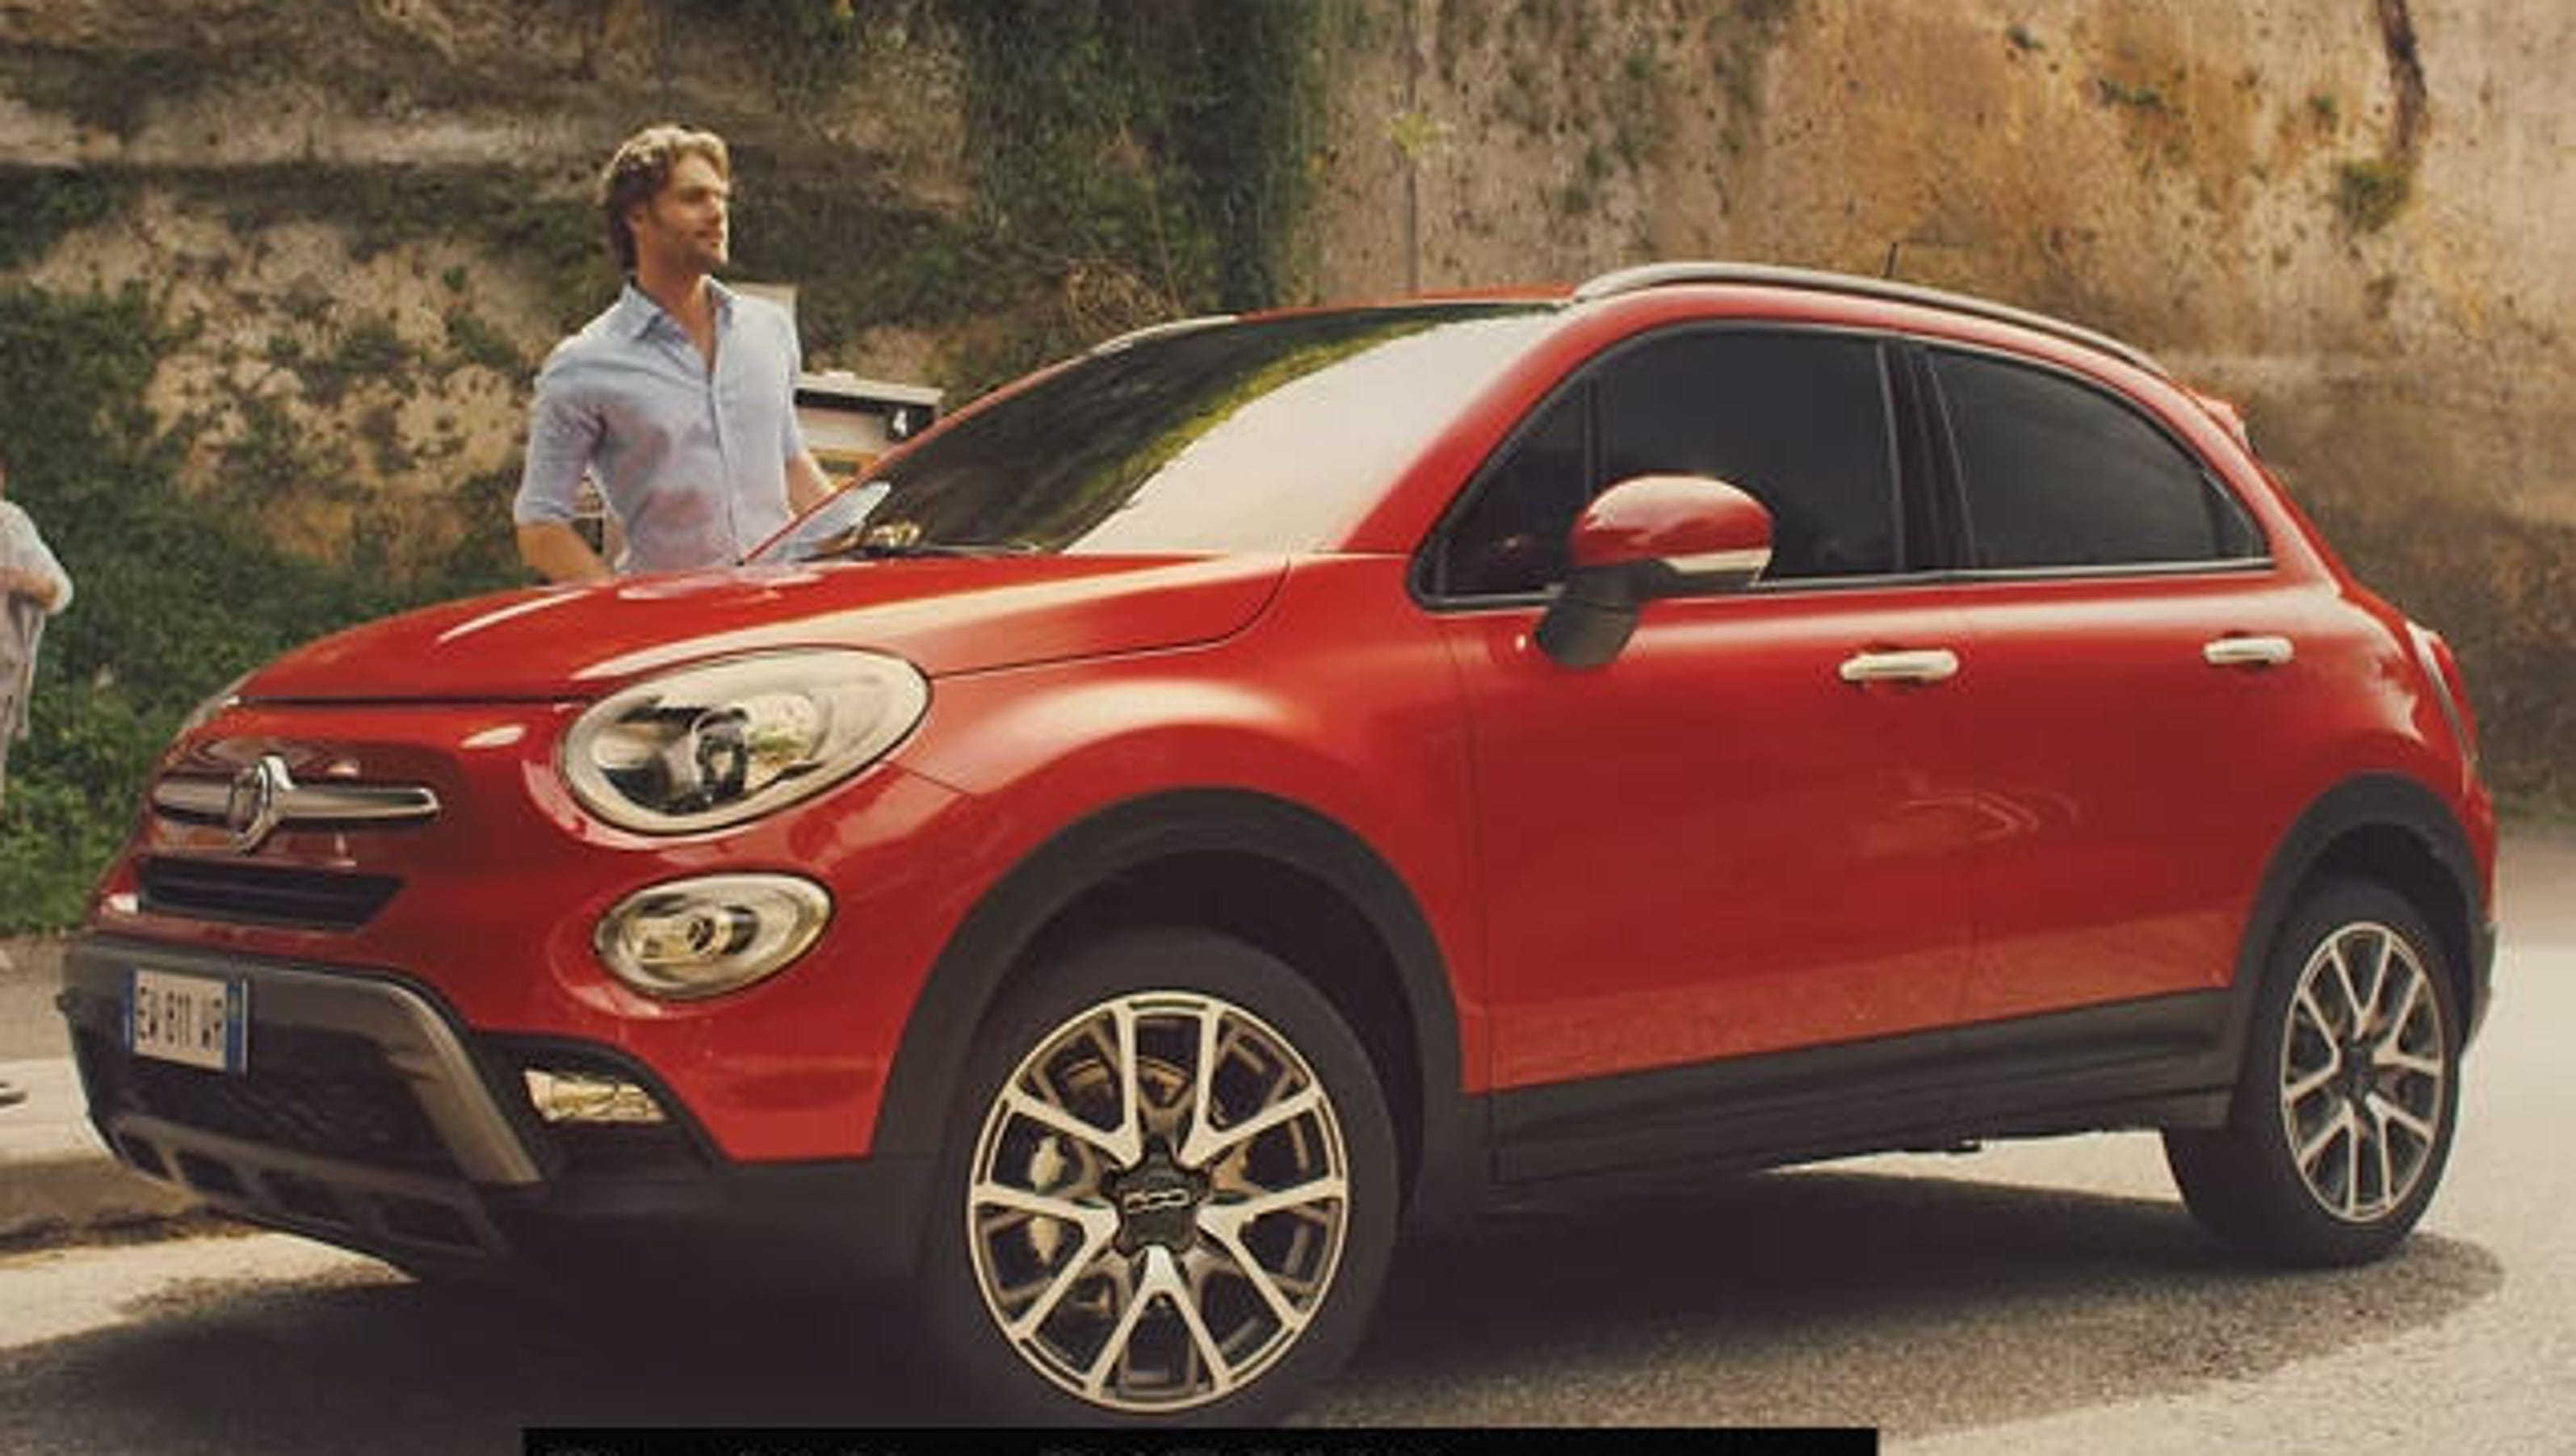 Fiat Chrysler Uses Humor Grandeur In Super Bowl Ads